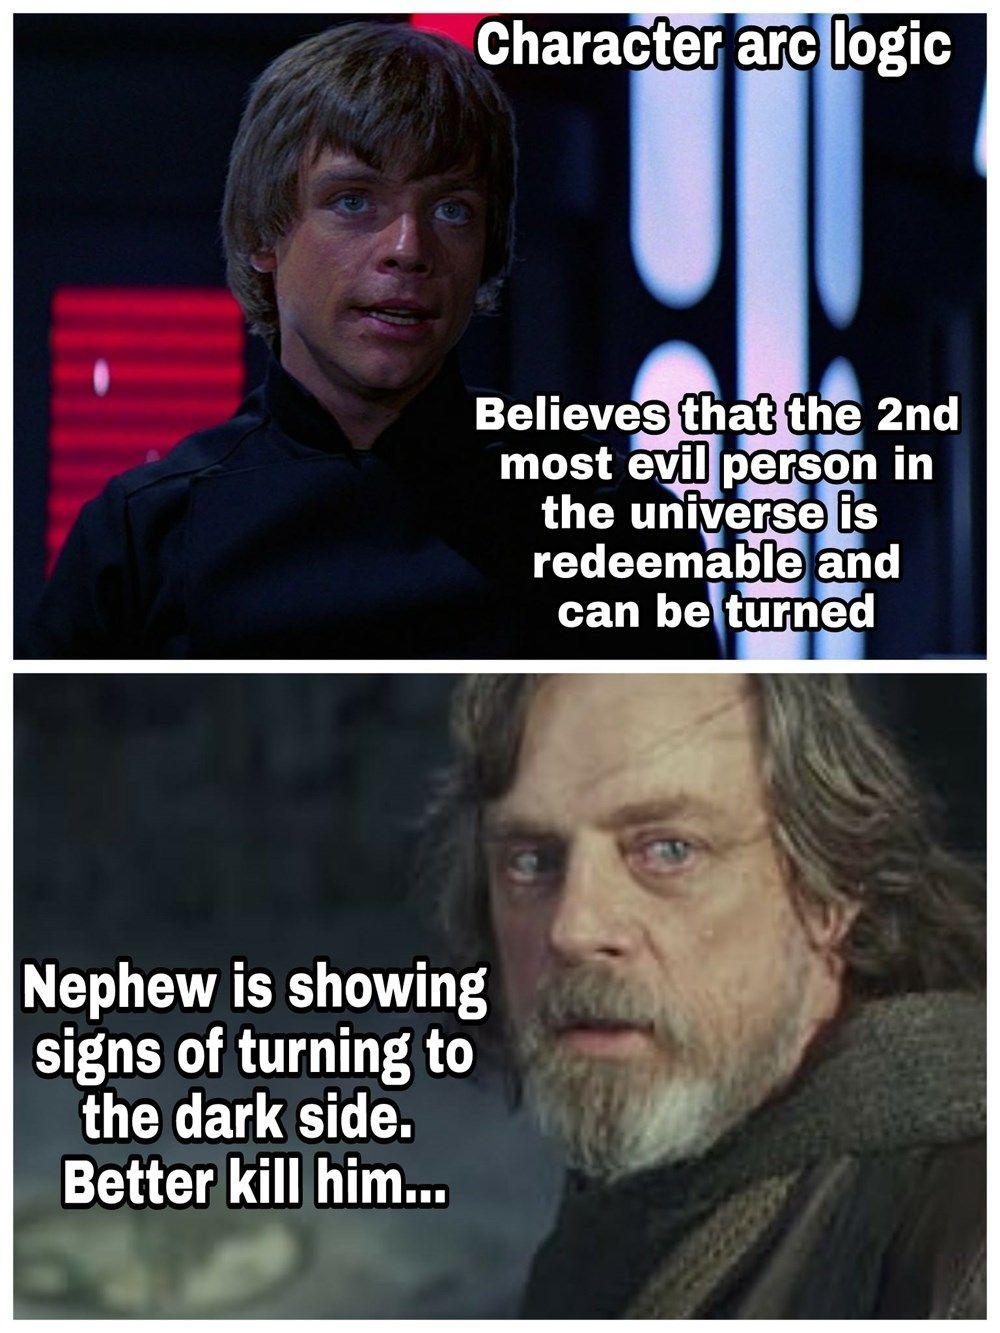 40 Deliciously Dank Star Wars Memes Star Wars Memes Funny Star Wars Memes Star Wars Humor